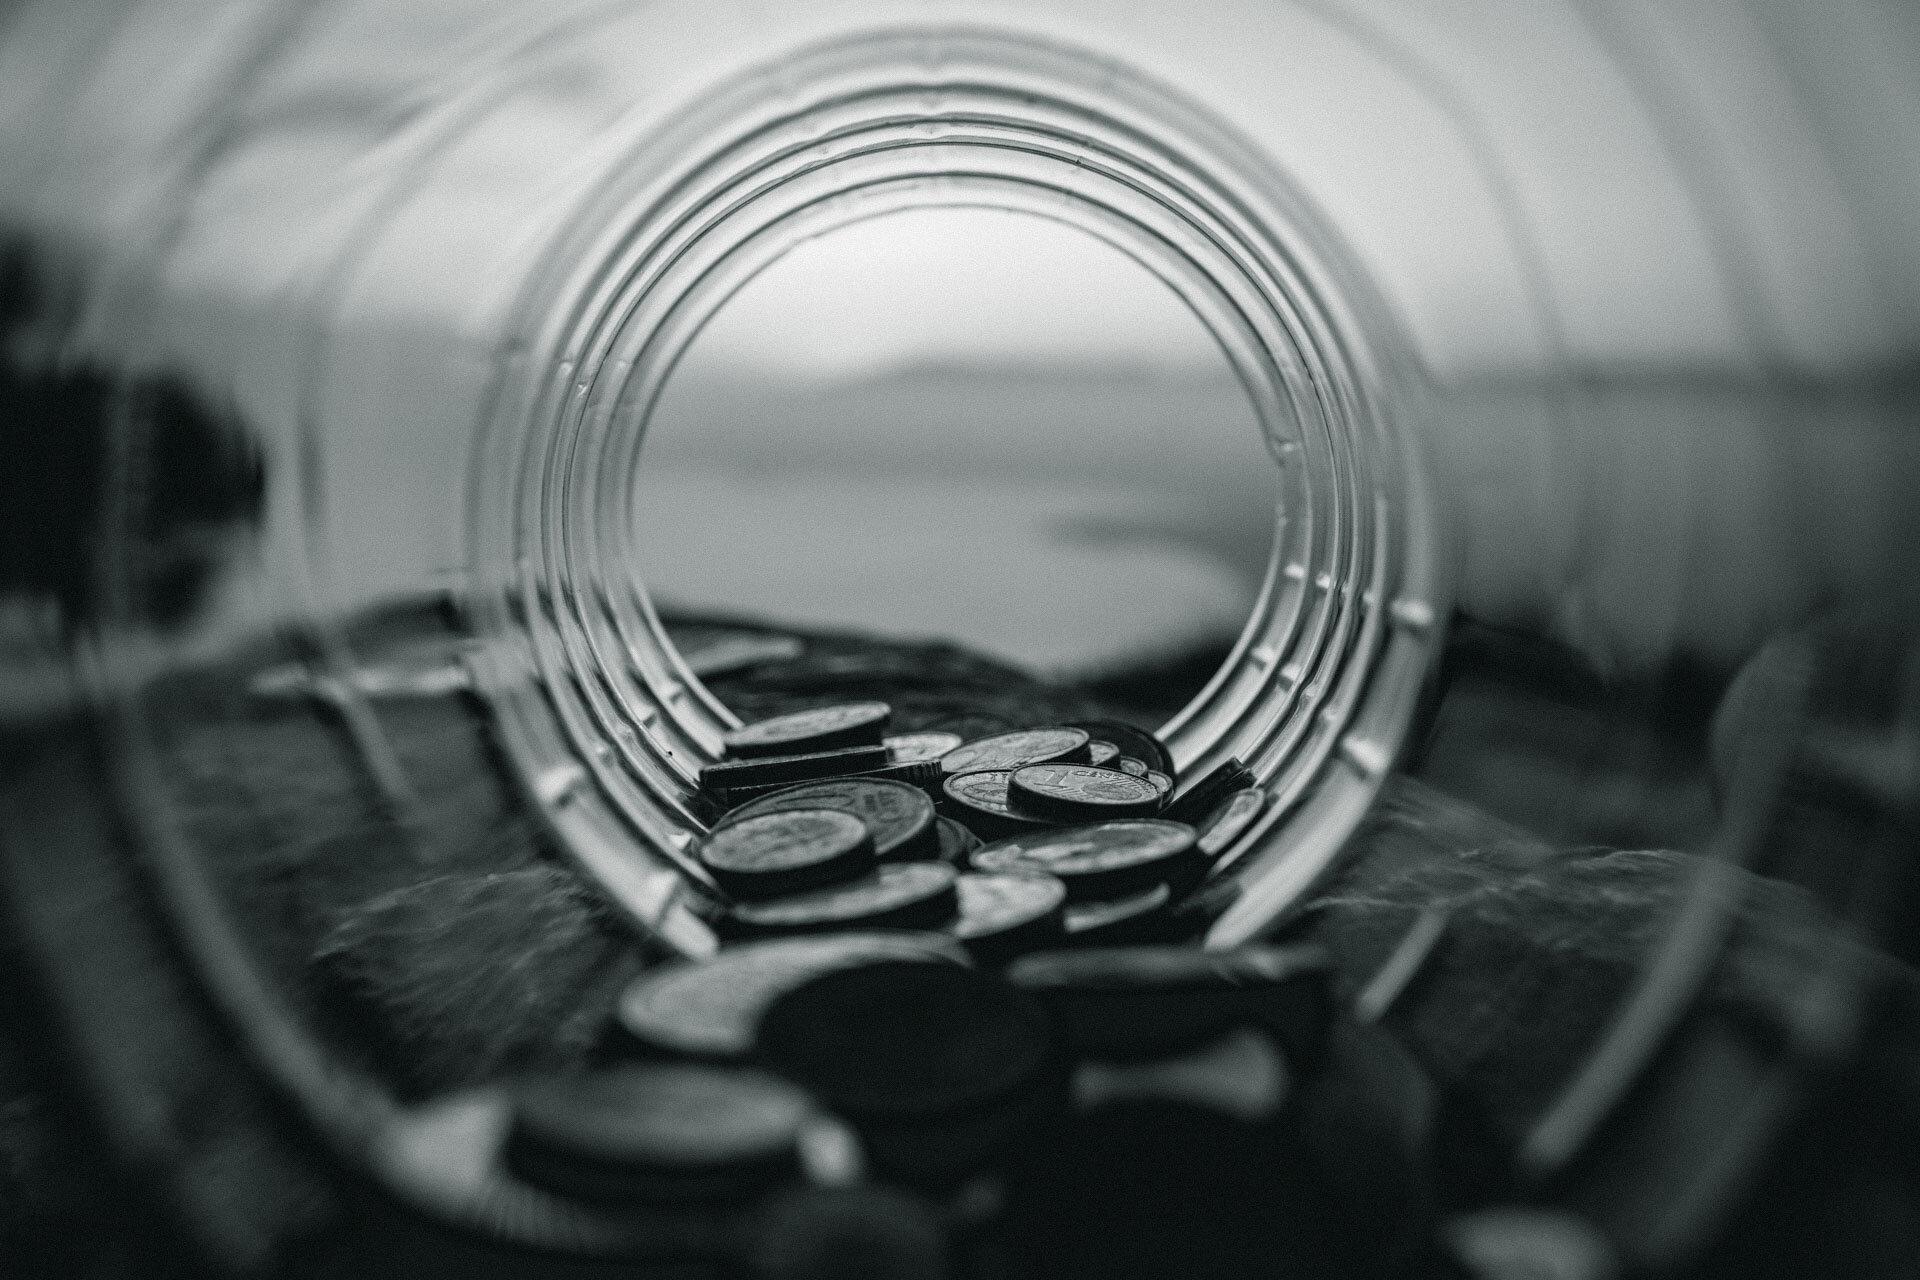 BPP 12 - Coins - IG-11.jpg